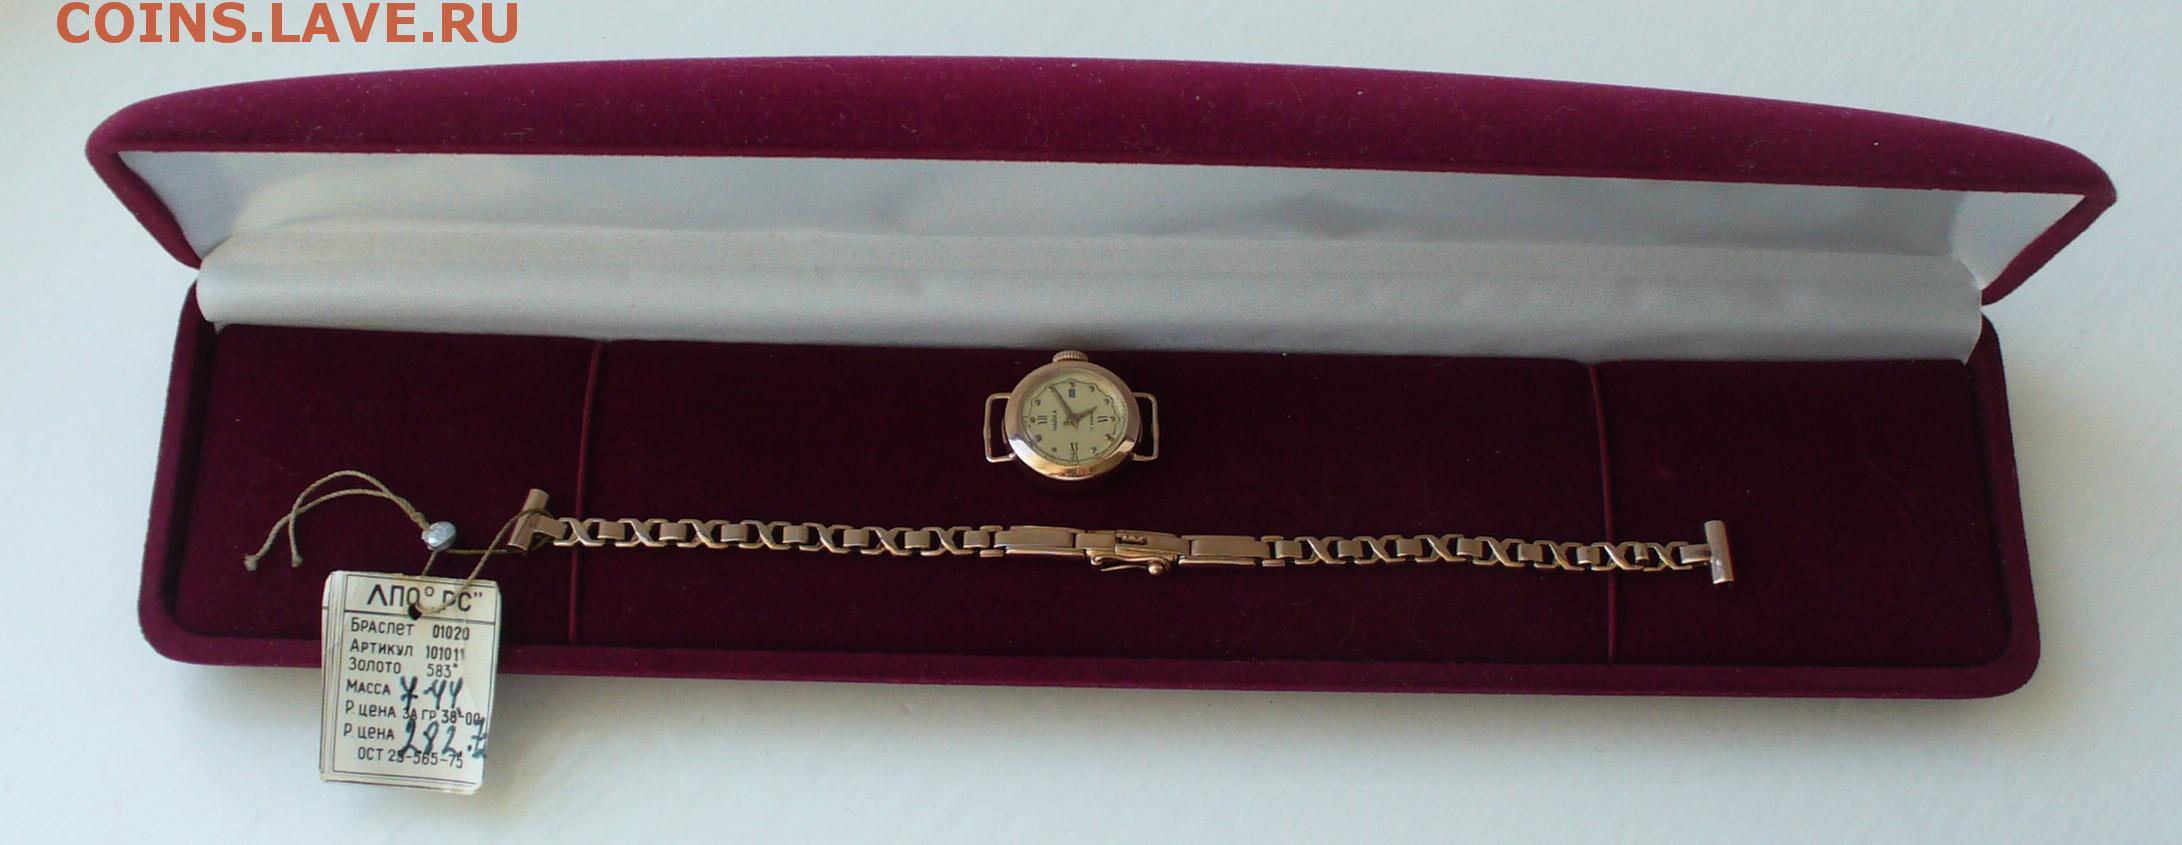 623b8f17 Часы женские